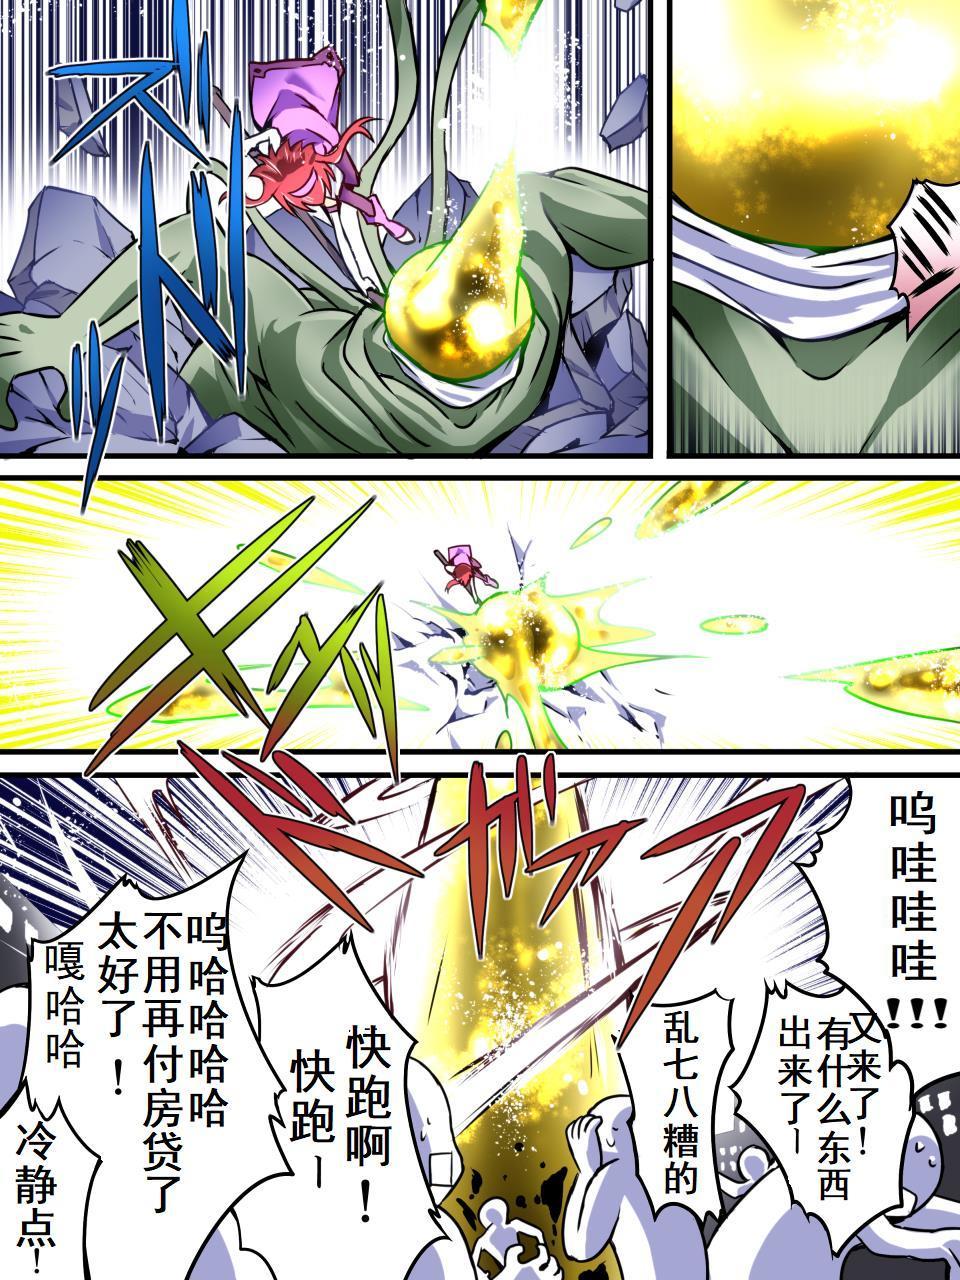 [Atelier Hachifukuan] Superheroine Yuukai Ryoujoku III - Superheroine in Distress [Chrome Rose Bell]   凌辱诱拐3 [Chinese] [有条色狼汉化] 8